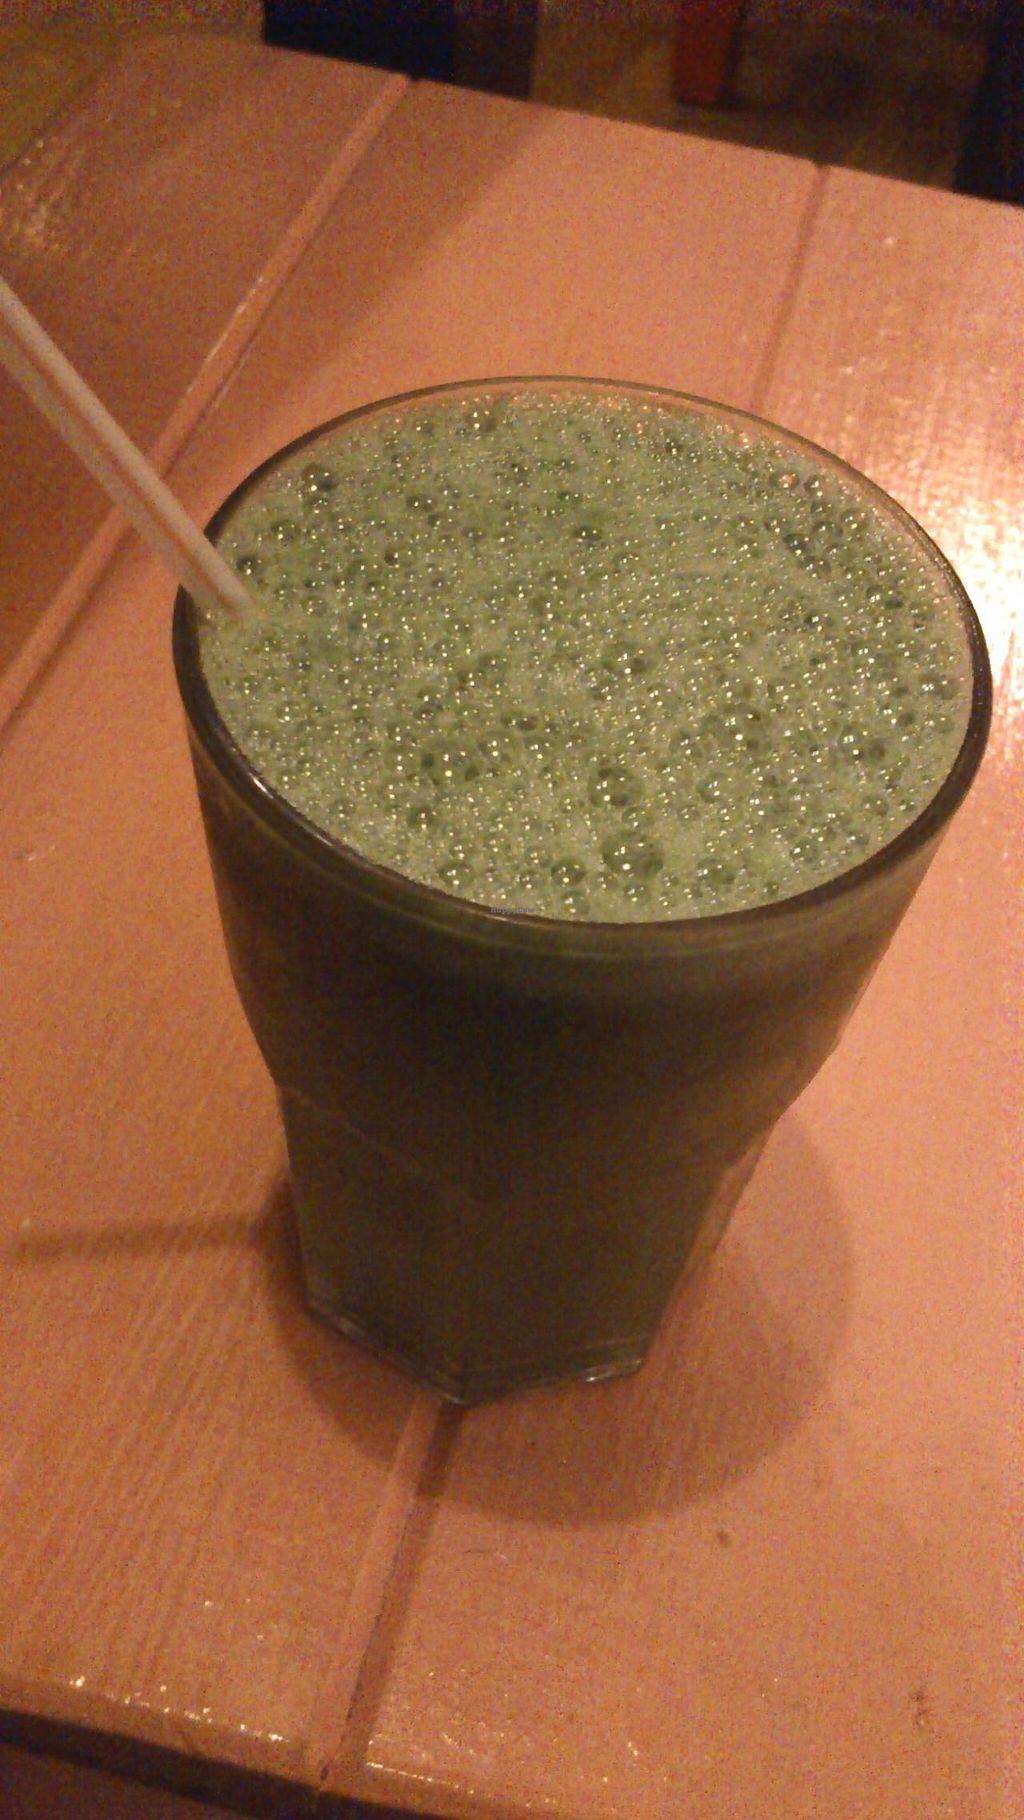 "Photo of Vaikuntha Resto  by <a href=""/members/profile/citizenInsane"">citizenInsane</a> <br/>green juice (pura vida) <br/> March 17, 2015  - <a href='/contact/abuse/image/53735/96022'>Report</a>"